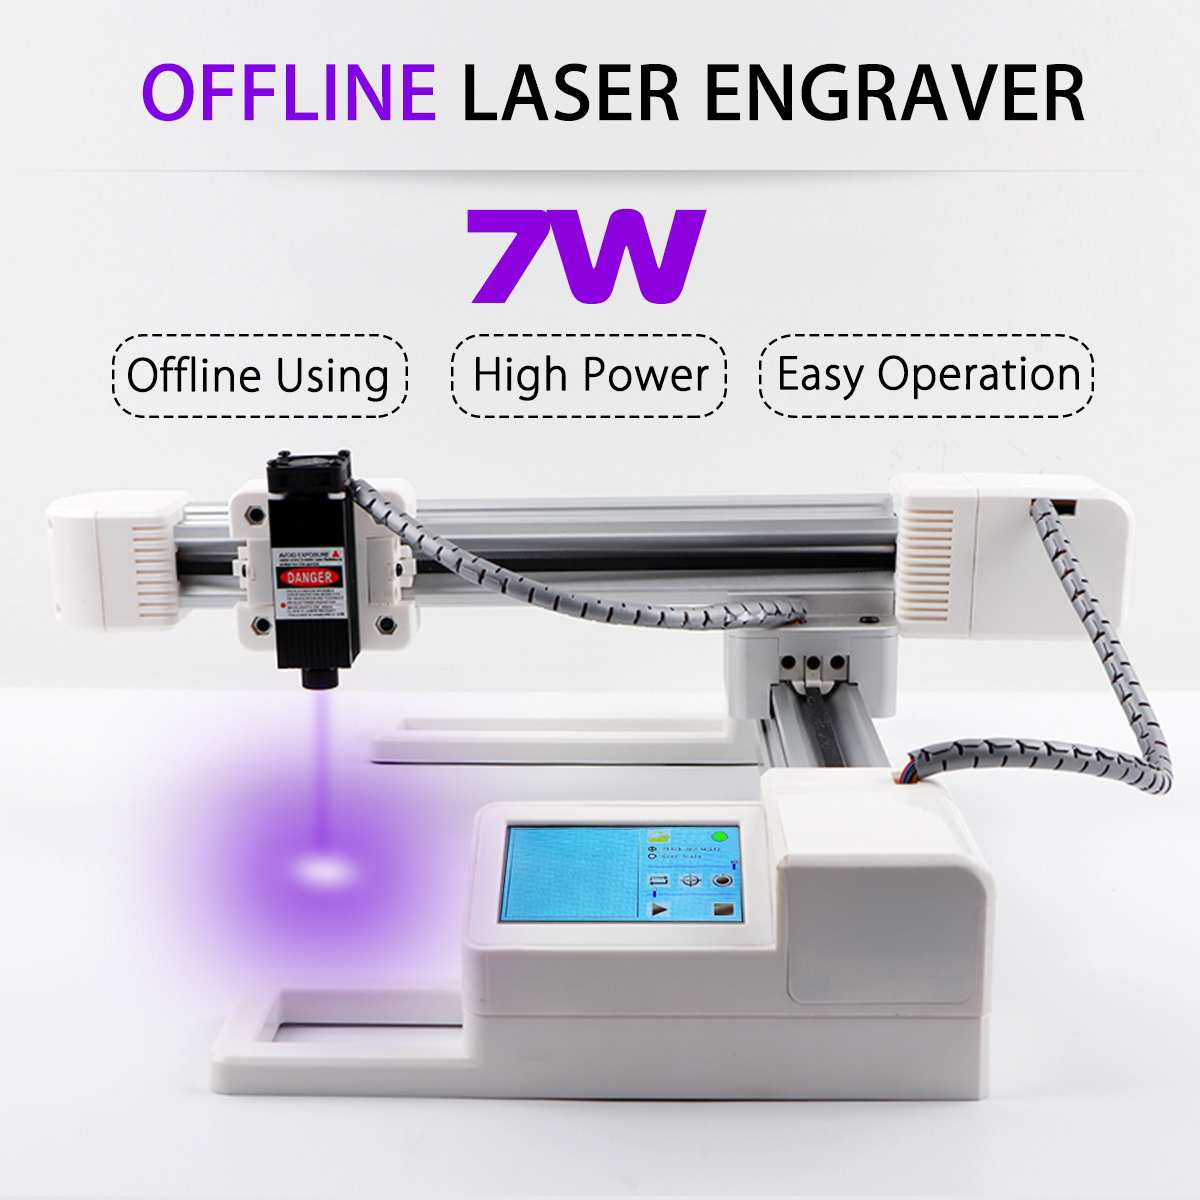 3W/7W USB Offline Laser Engraver DIY Logo Mark Printer Big Power CNC Laser Engraving Carving Machine 15.5x17.5cm Carving Area